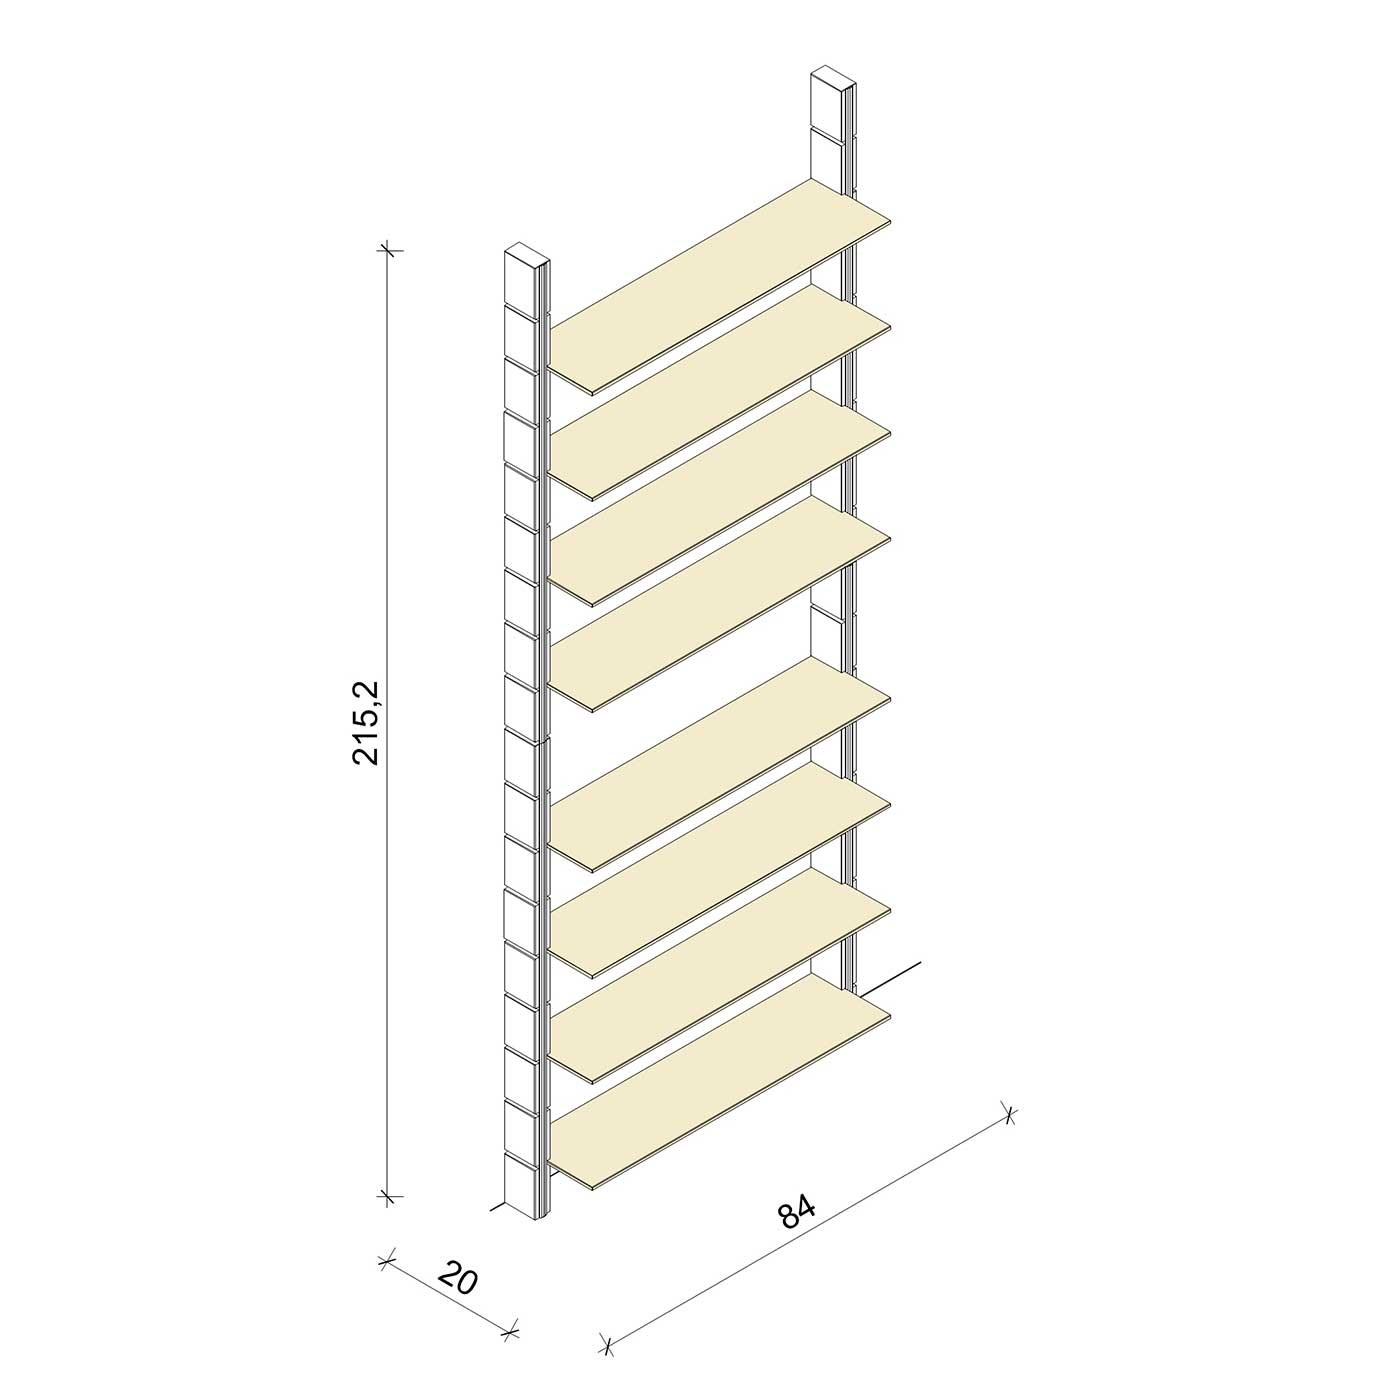 Bücherregal - Classic (XL) 84 - Maß: 84 x 215,2 x 20 cm (B x H x T)